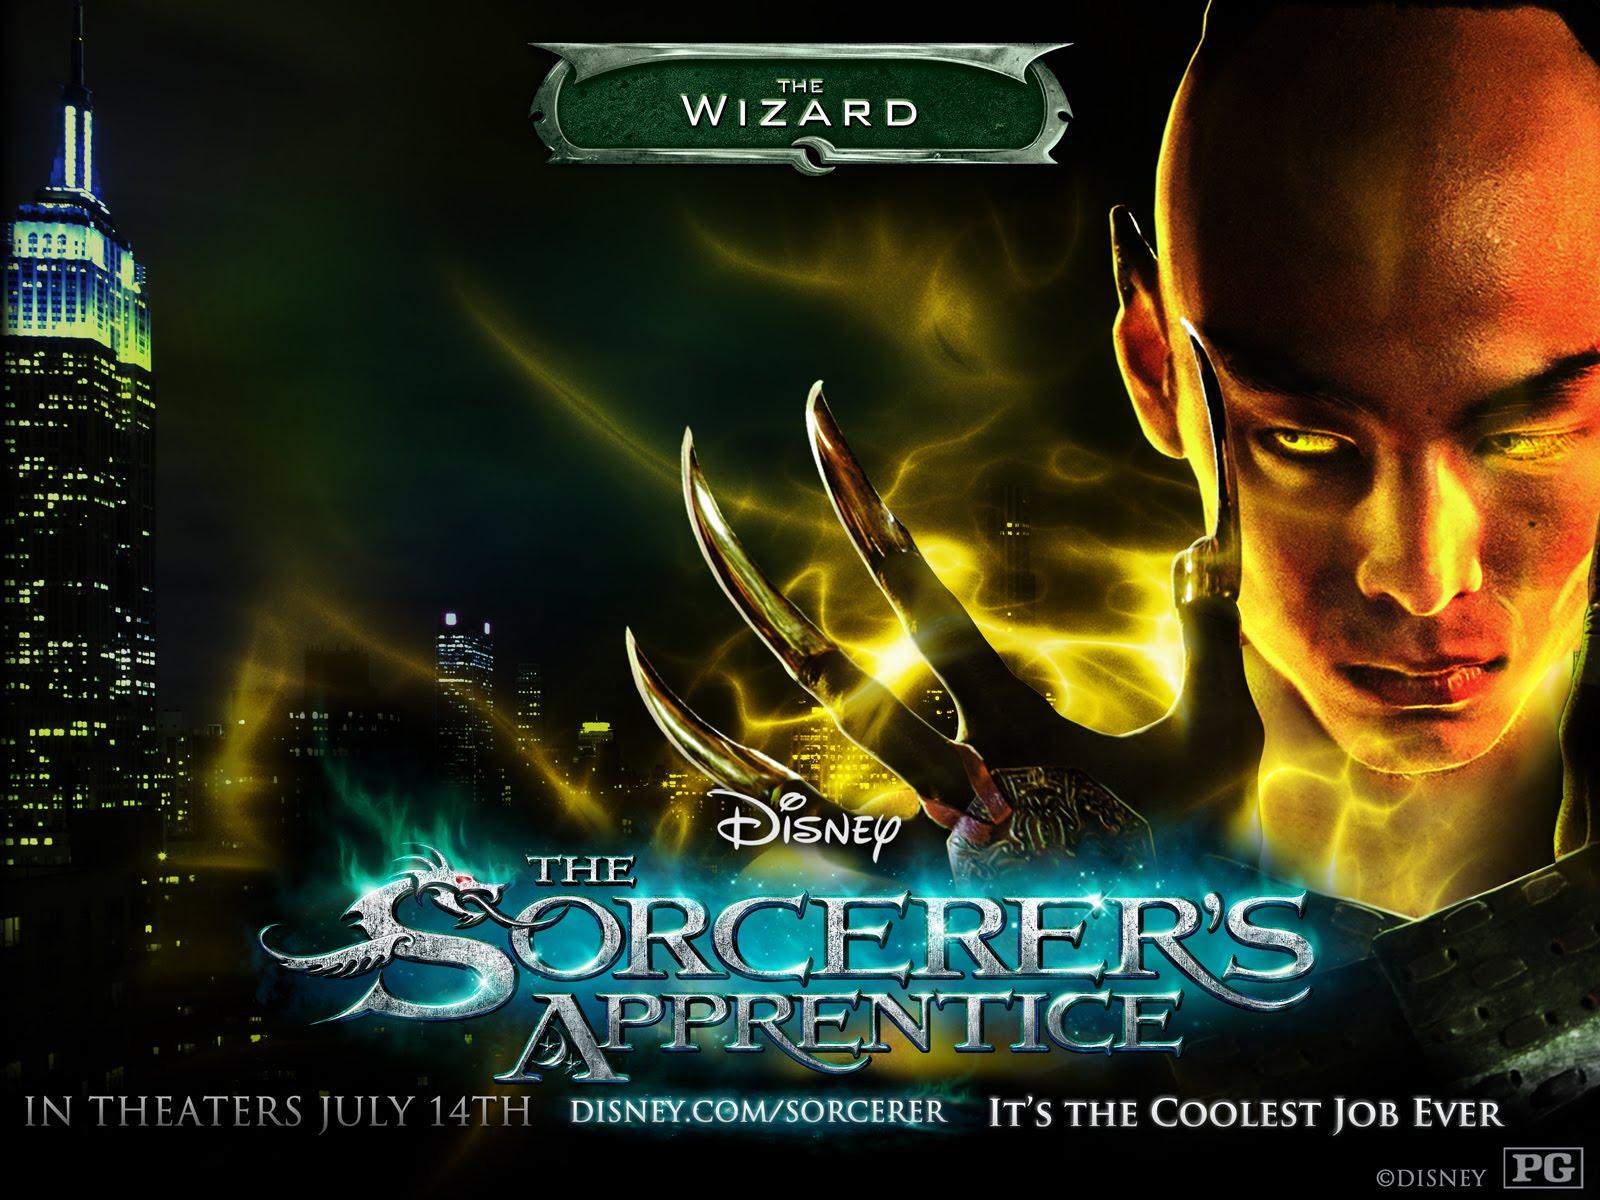 http://1.bp.blogspot.com/_V6TVDECge74/TFP2fNgrDVI/AAAAAAAAAyM/dU06gLjWpnQ/s1600/Ethan_Peck_dans_The_Sorcerers_Apprentice_Wallpaper_HD.jpg